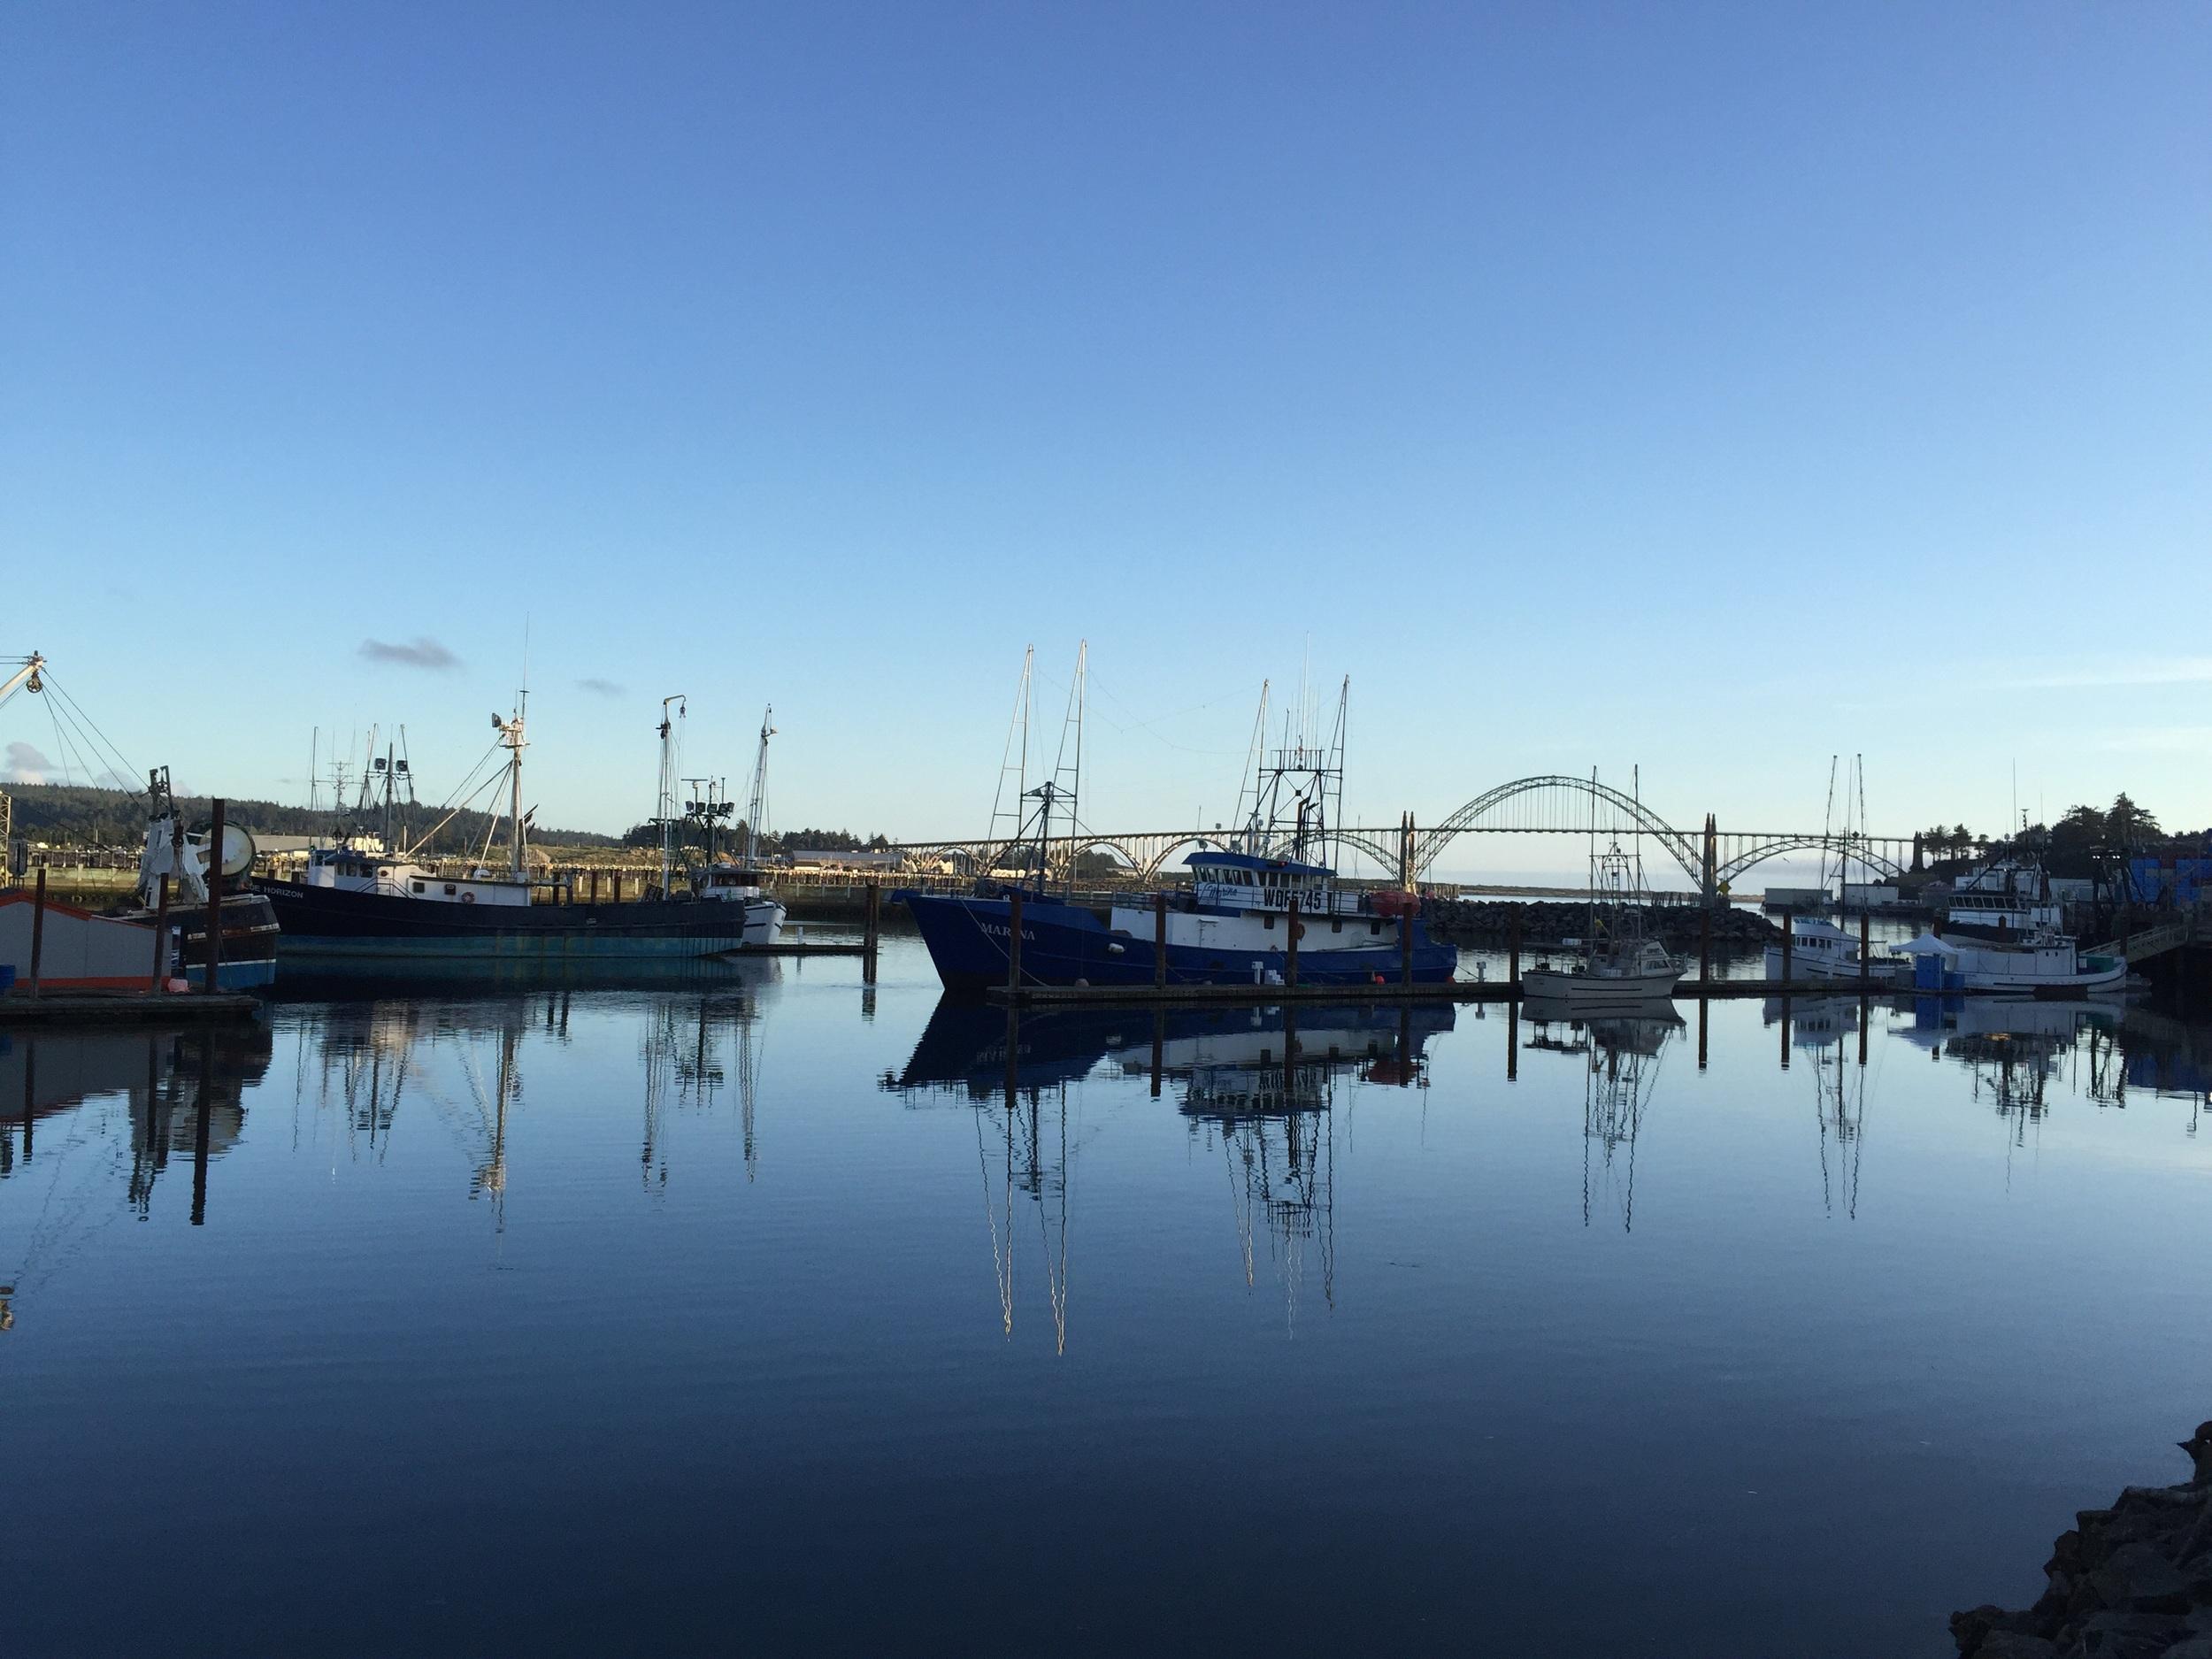 Newport Marina and bridge